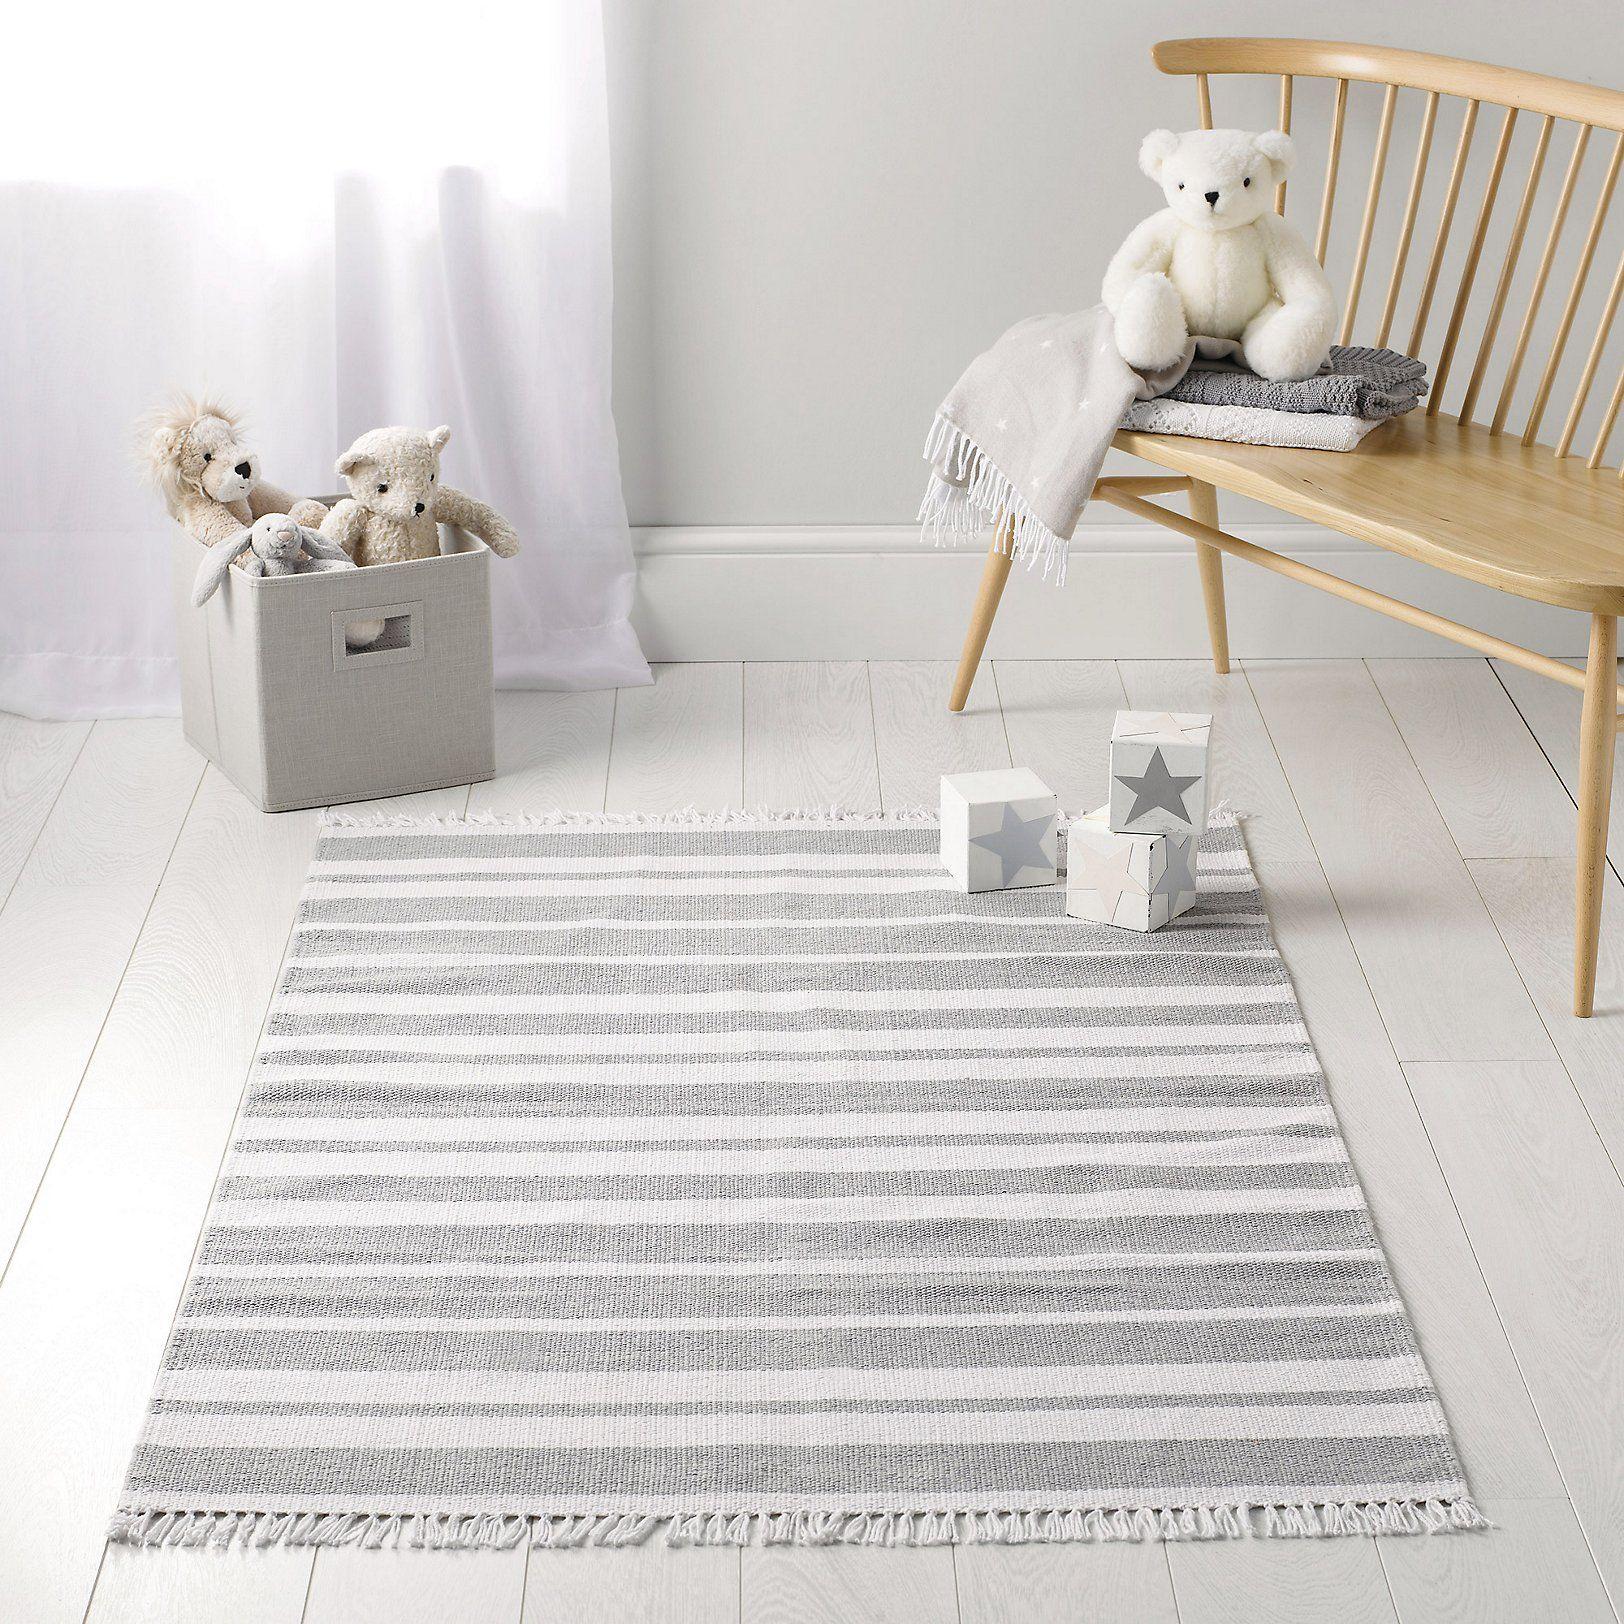 Grey Stripe Rug Bedroom Accessories Childrens Bedroom The